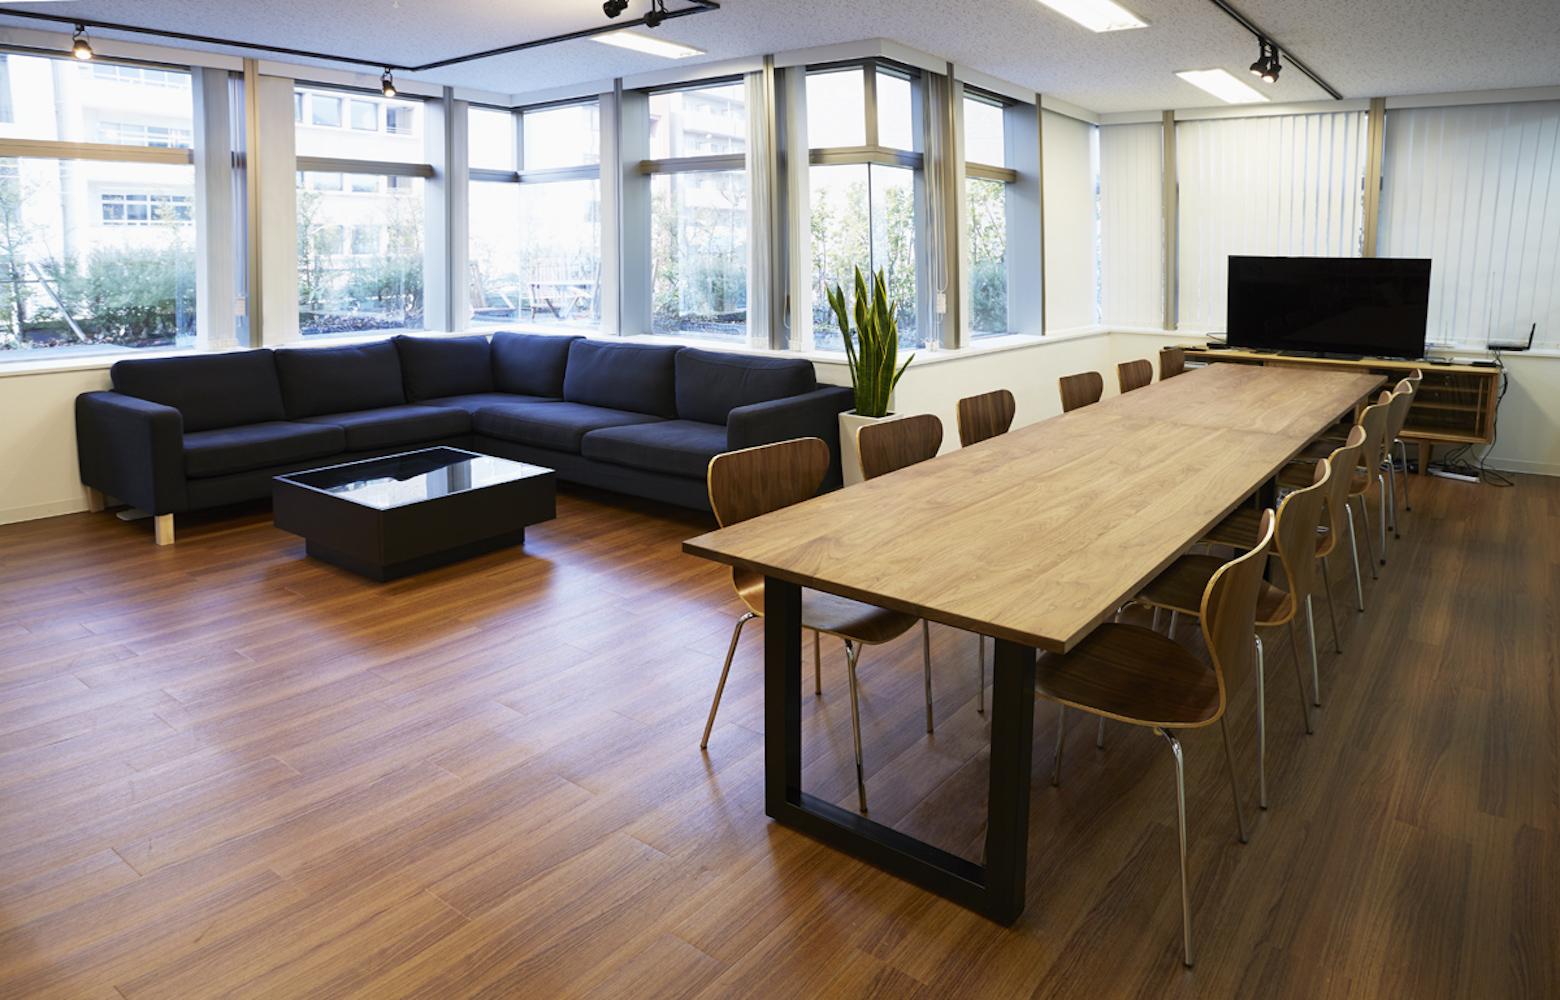 UIEvolution株式会社 vol.1 Meeting Space デザイン・レイアウト事例